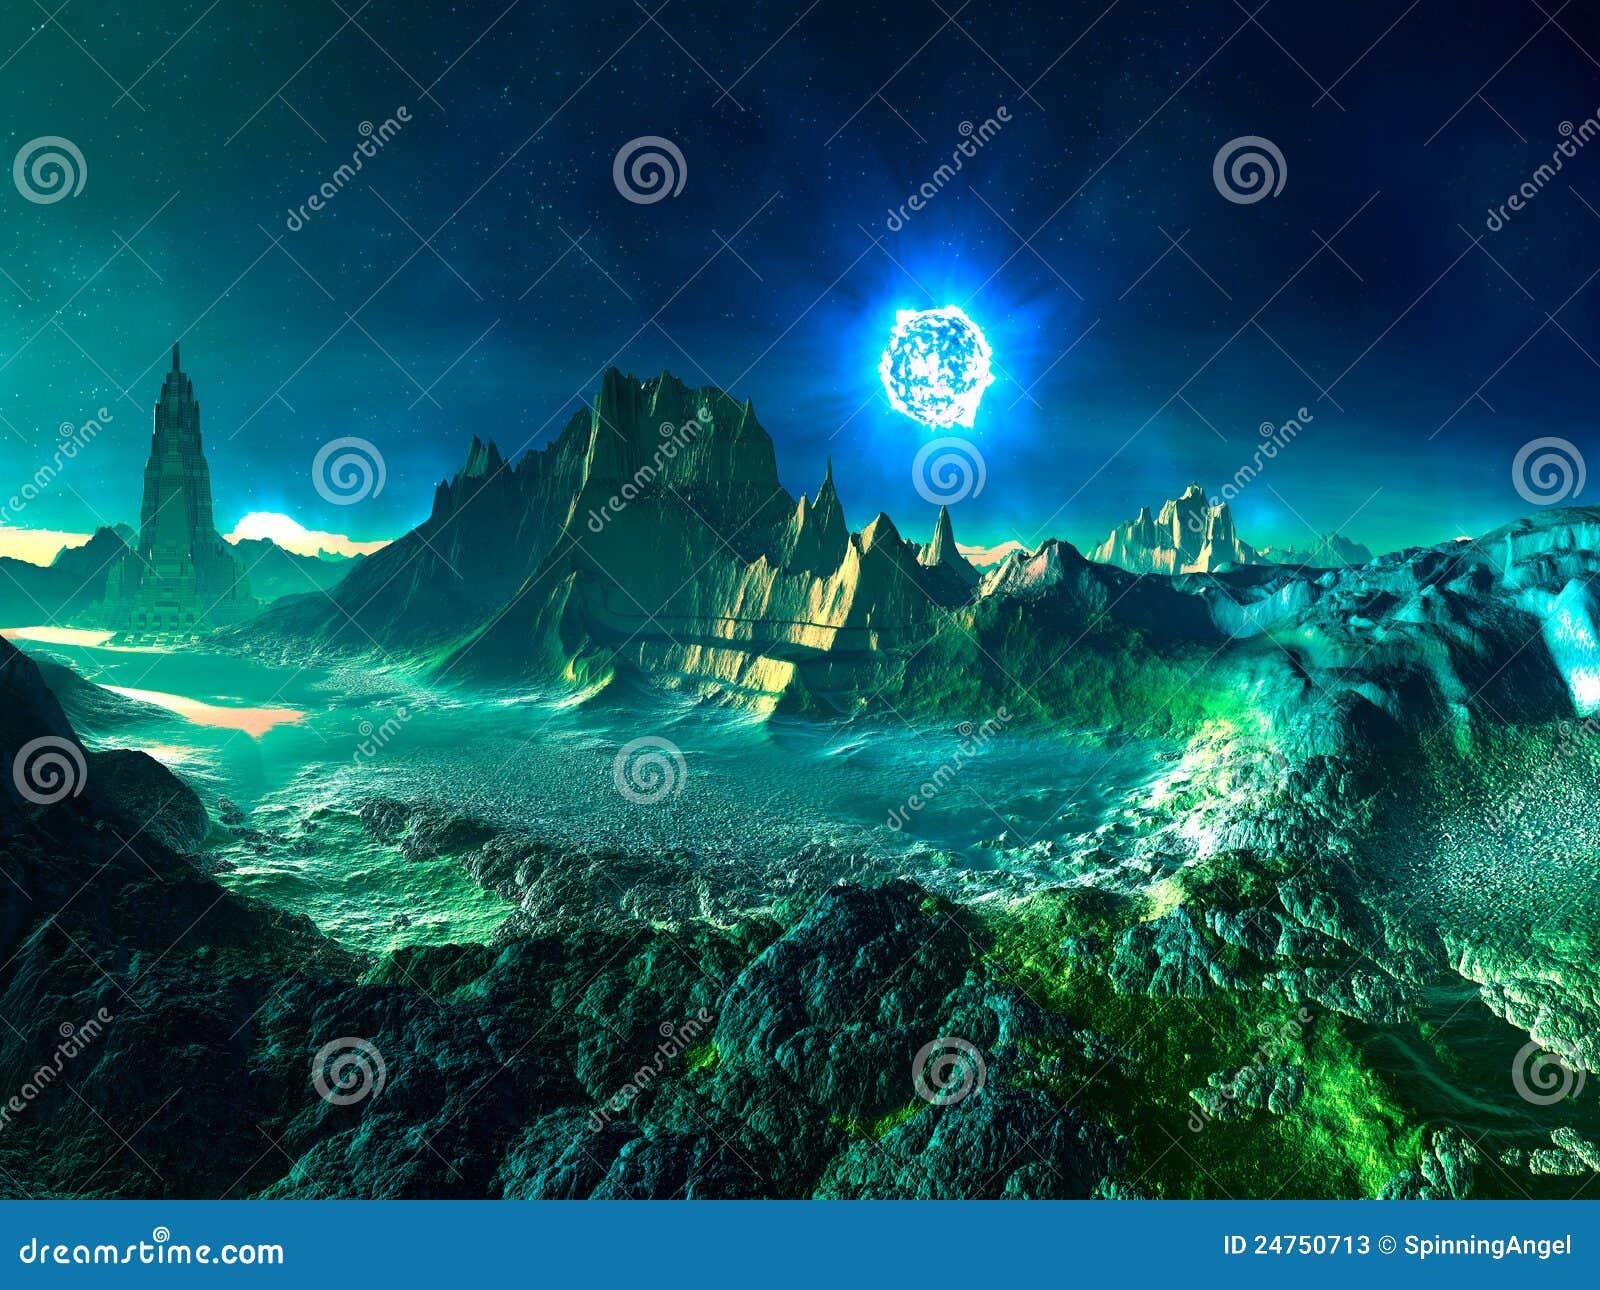 Alien Planet With Neutron Star Stock Photos - Image: 24750713